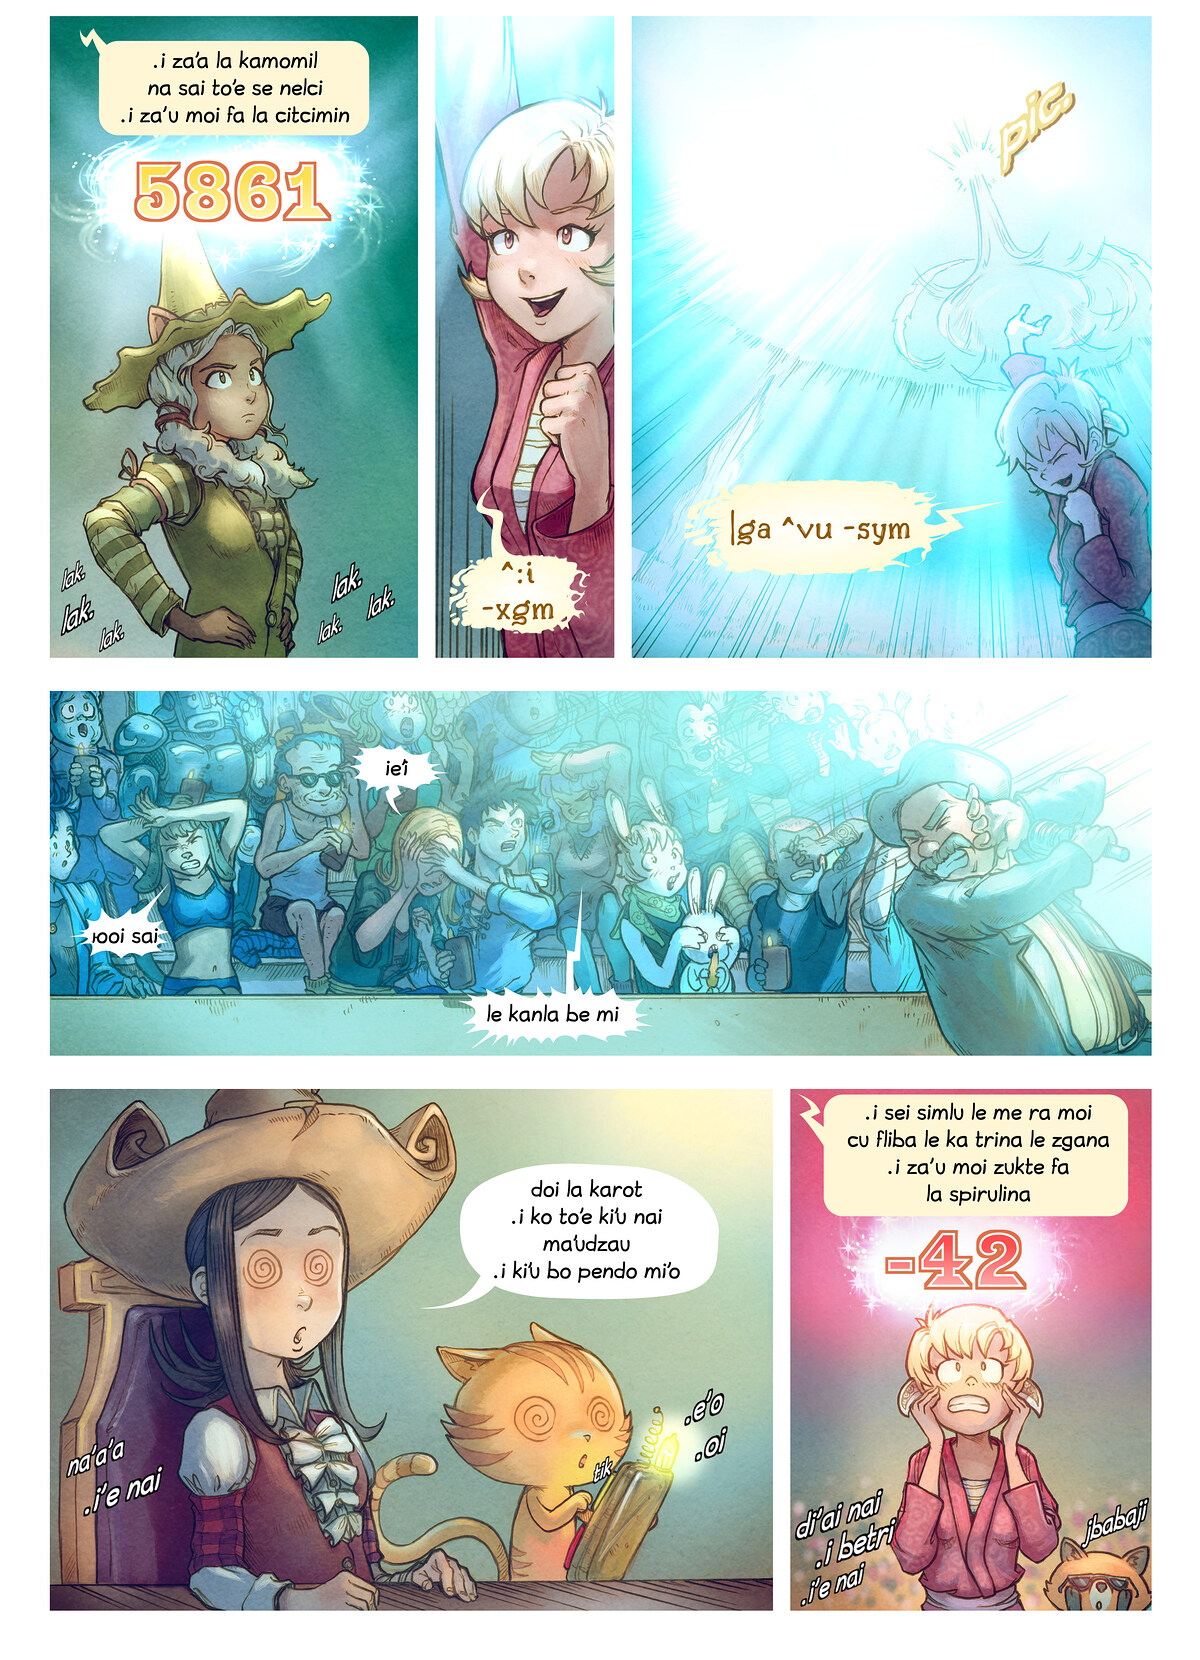 A webcomic page of Pepper&Carrot, pagbu 22 [jb], papri 6